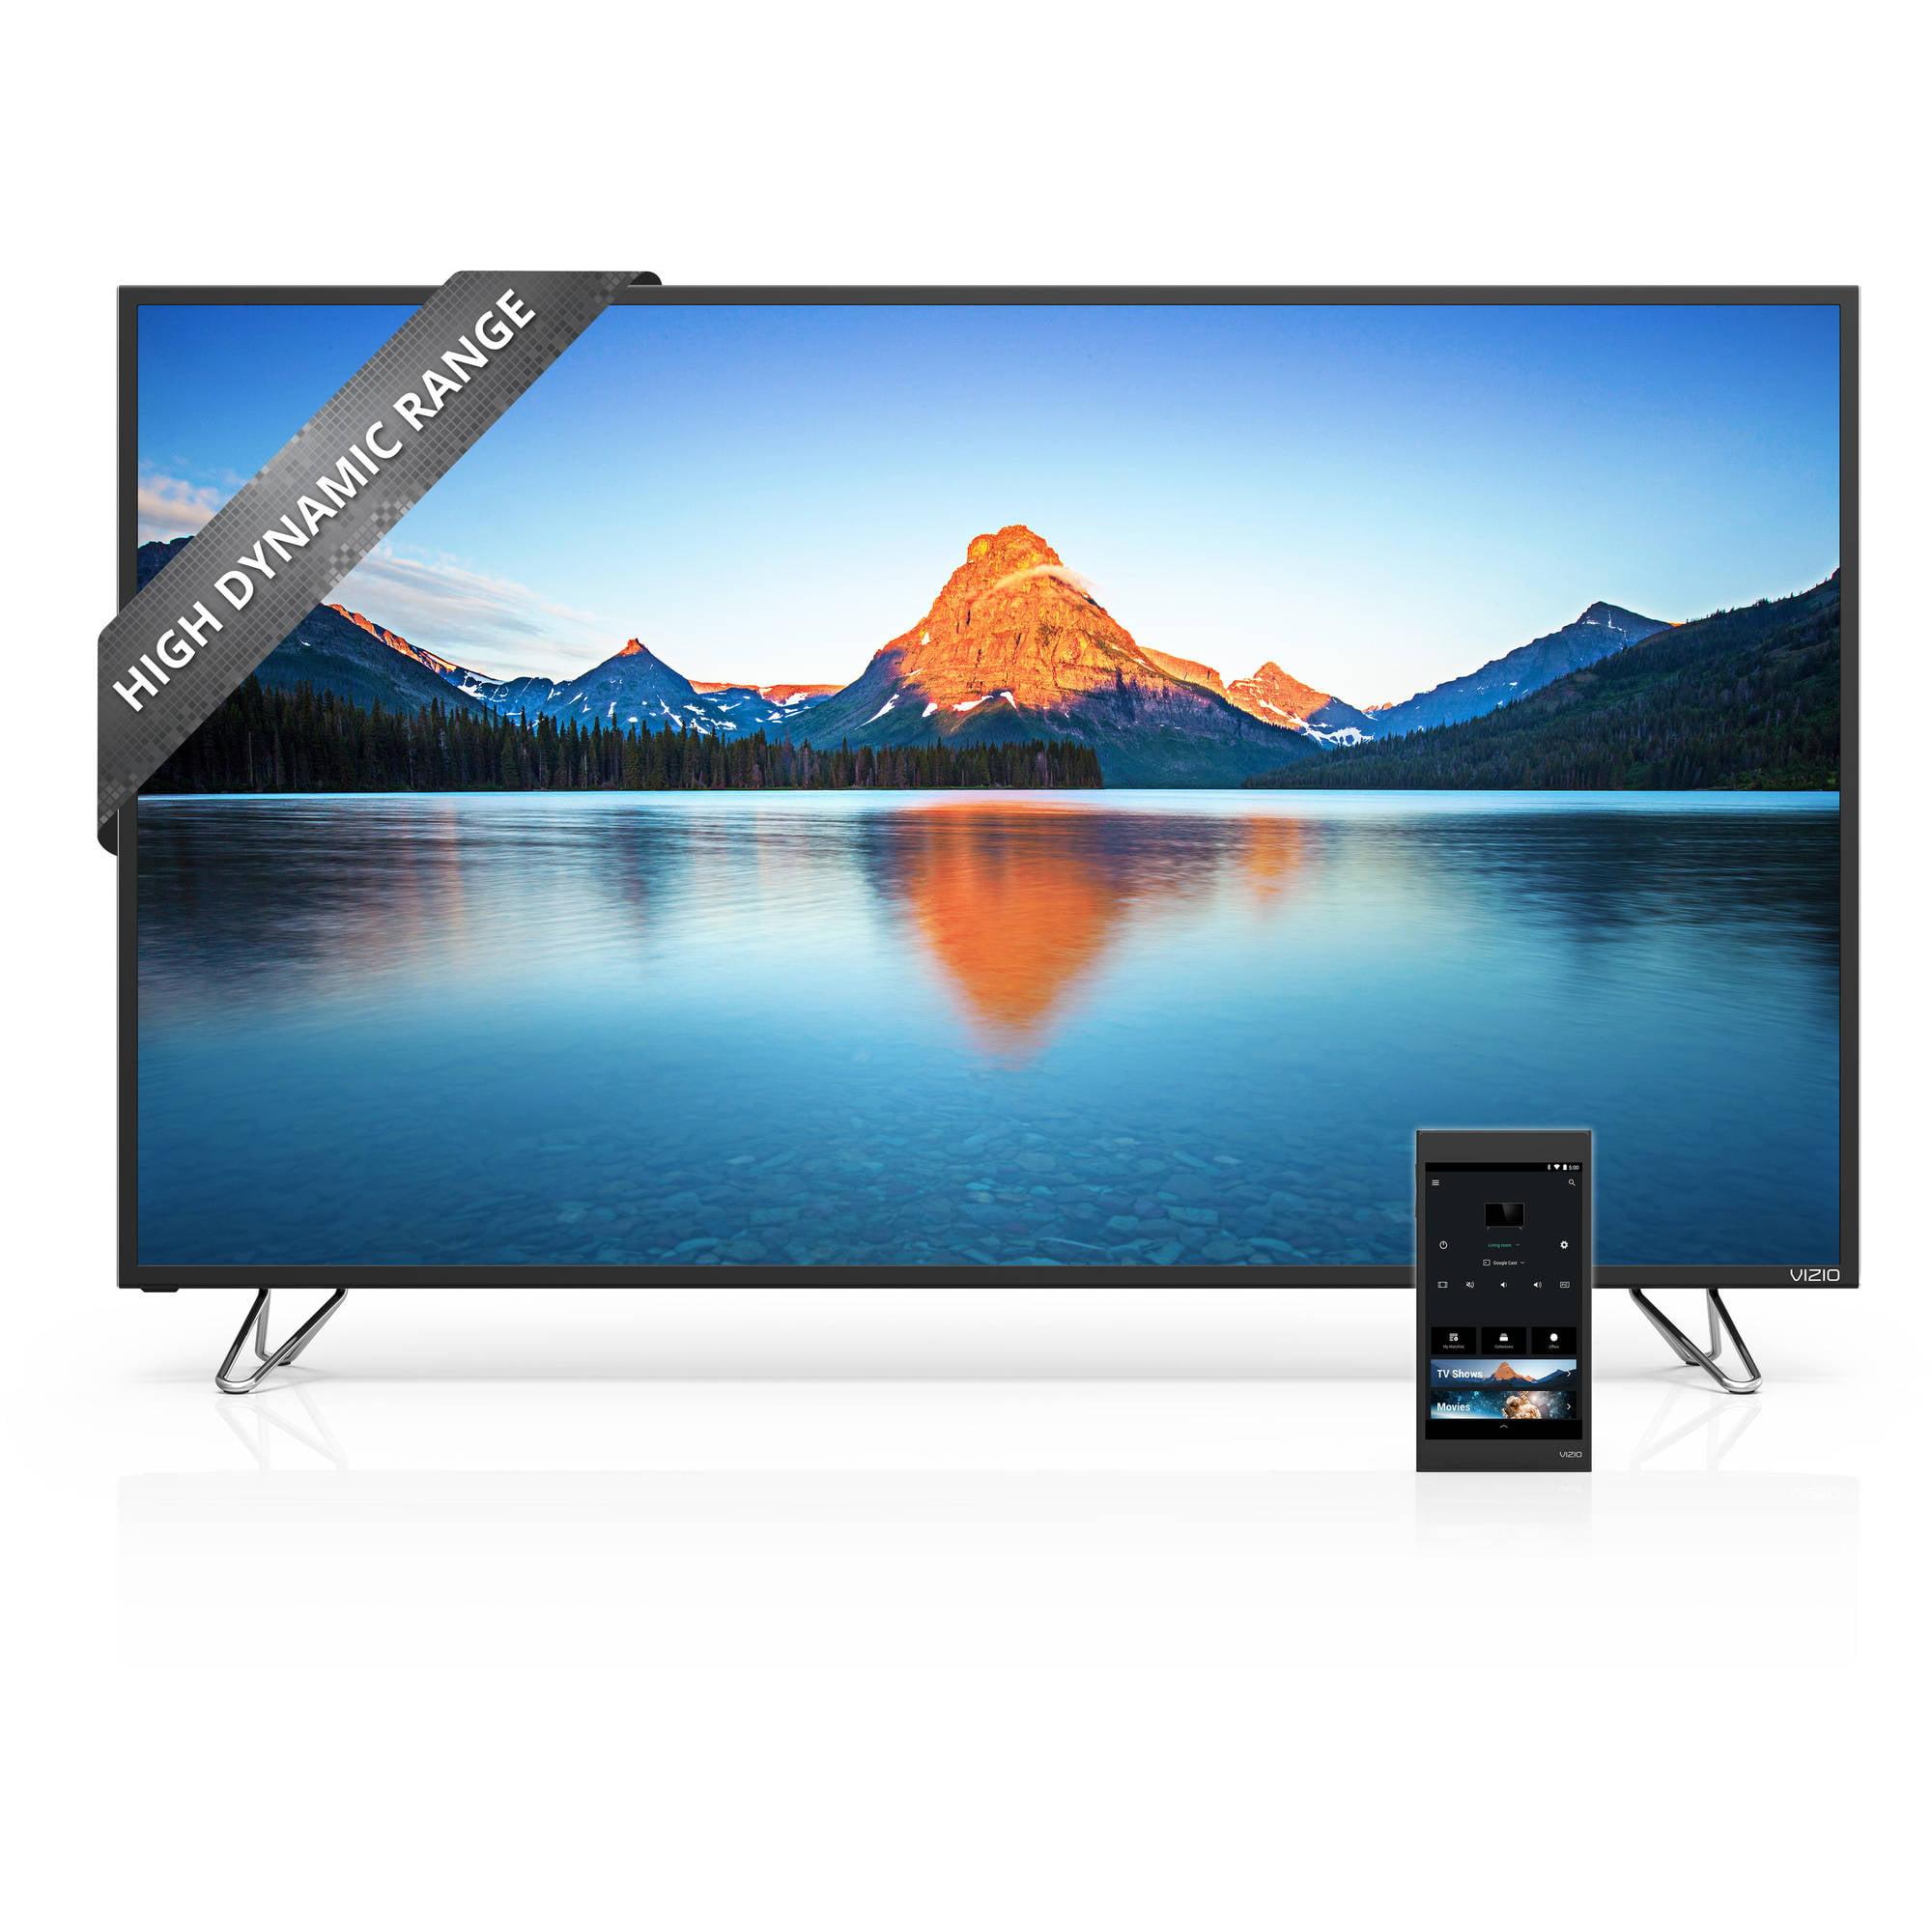 Televisores Led o Oled VIZIO serie SmartCast M65-D0 65